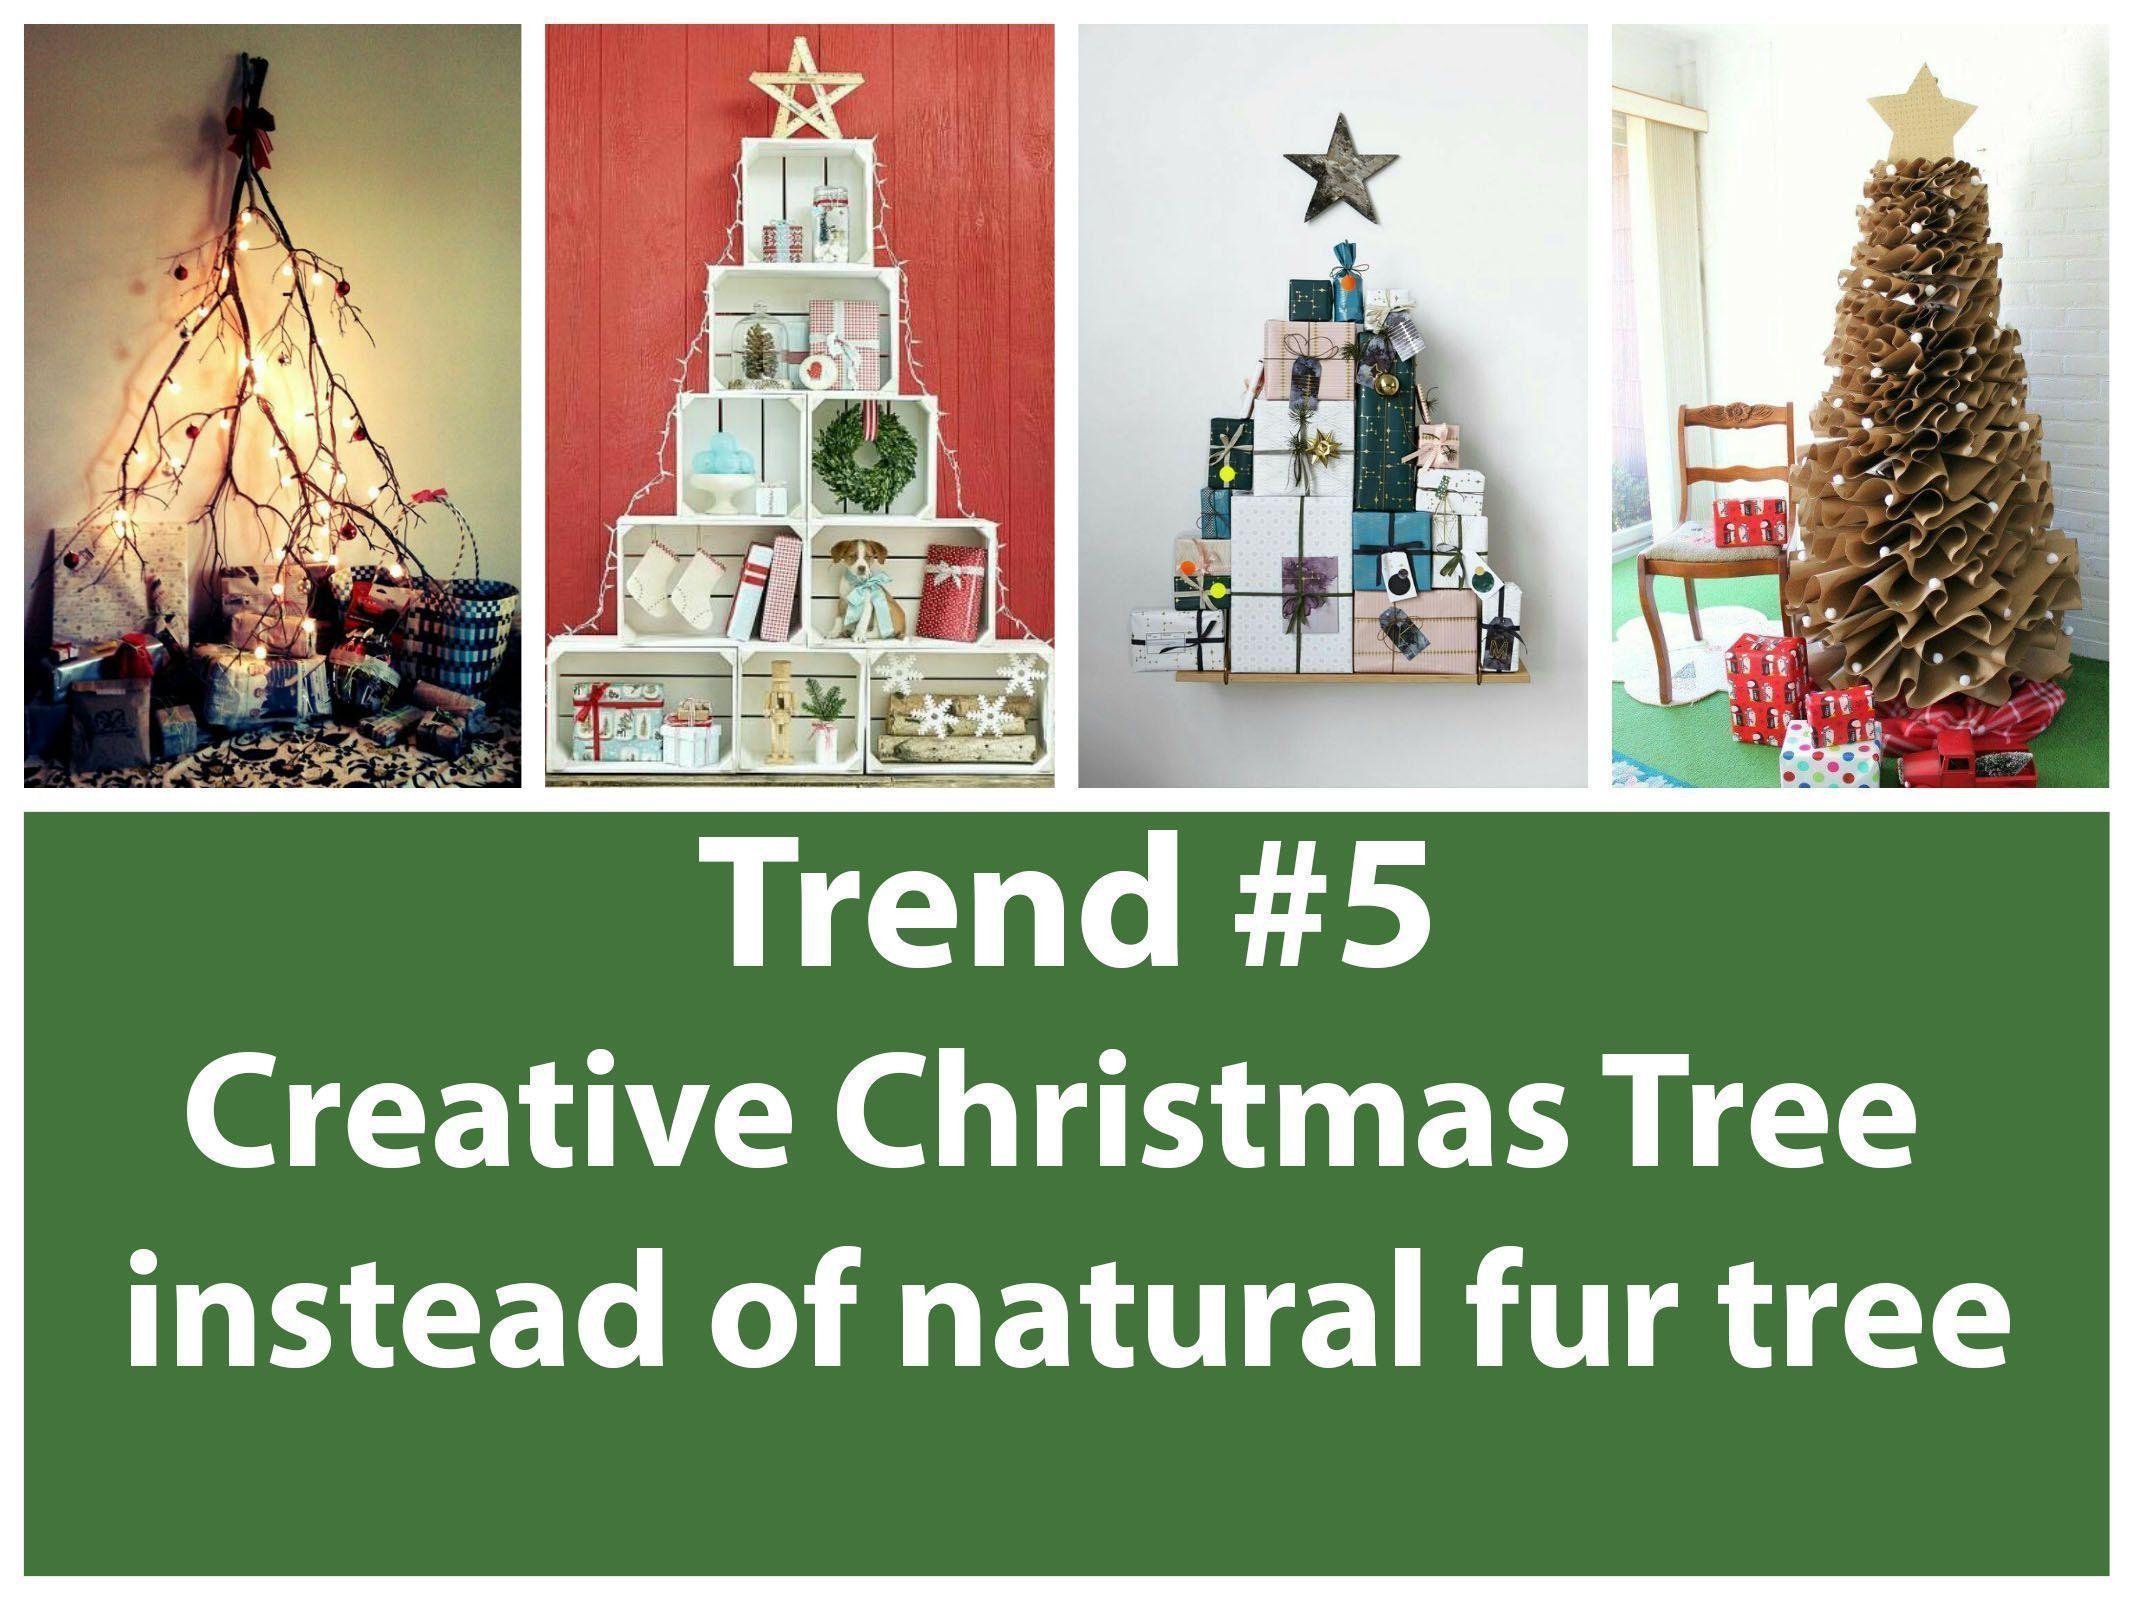 Top 5 Winter Decor Trends, Winter Decor Trends, Winter Decorating